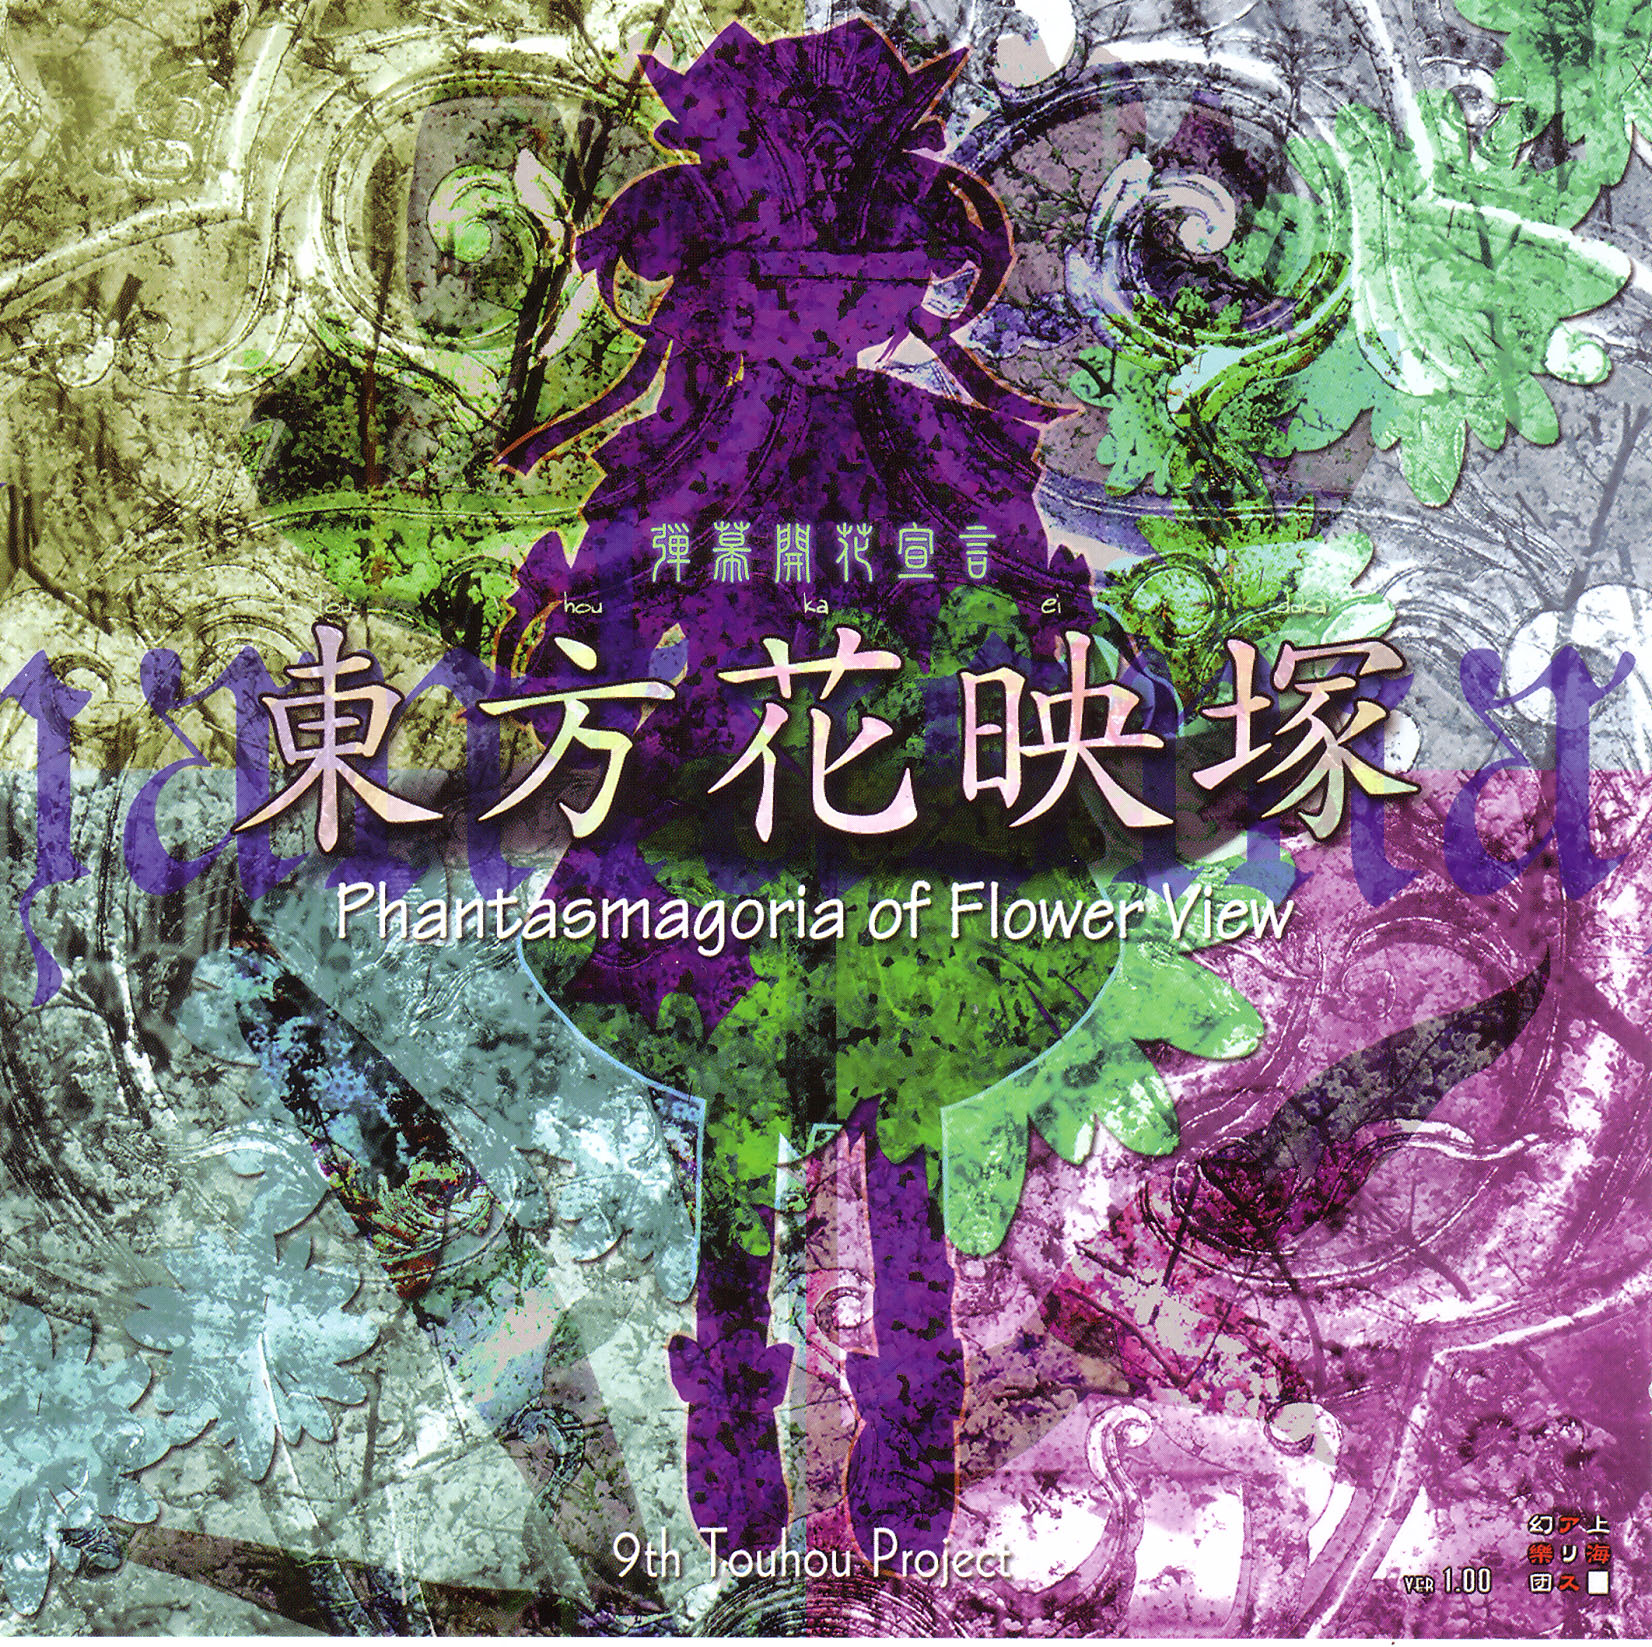 Phantasmagoria of Flower View | Touhou Wiki | FANDOM powered